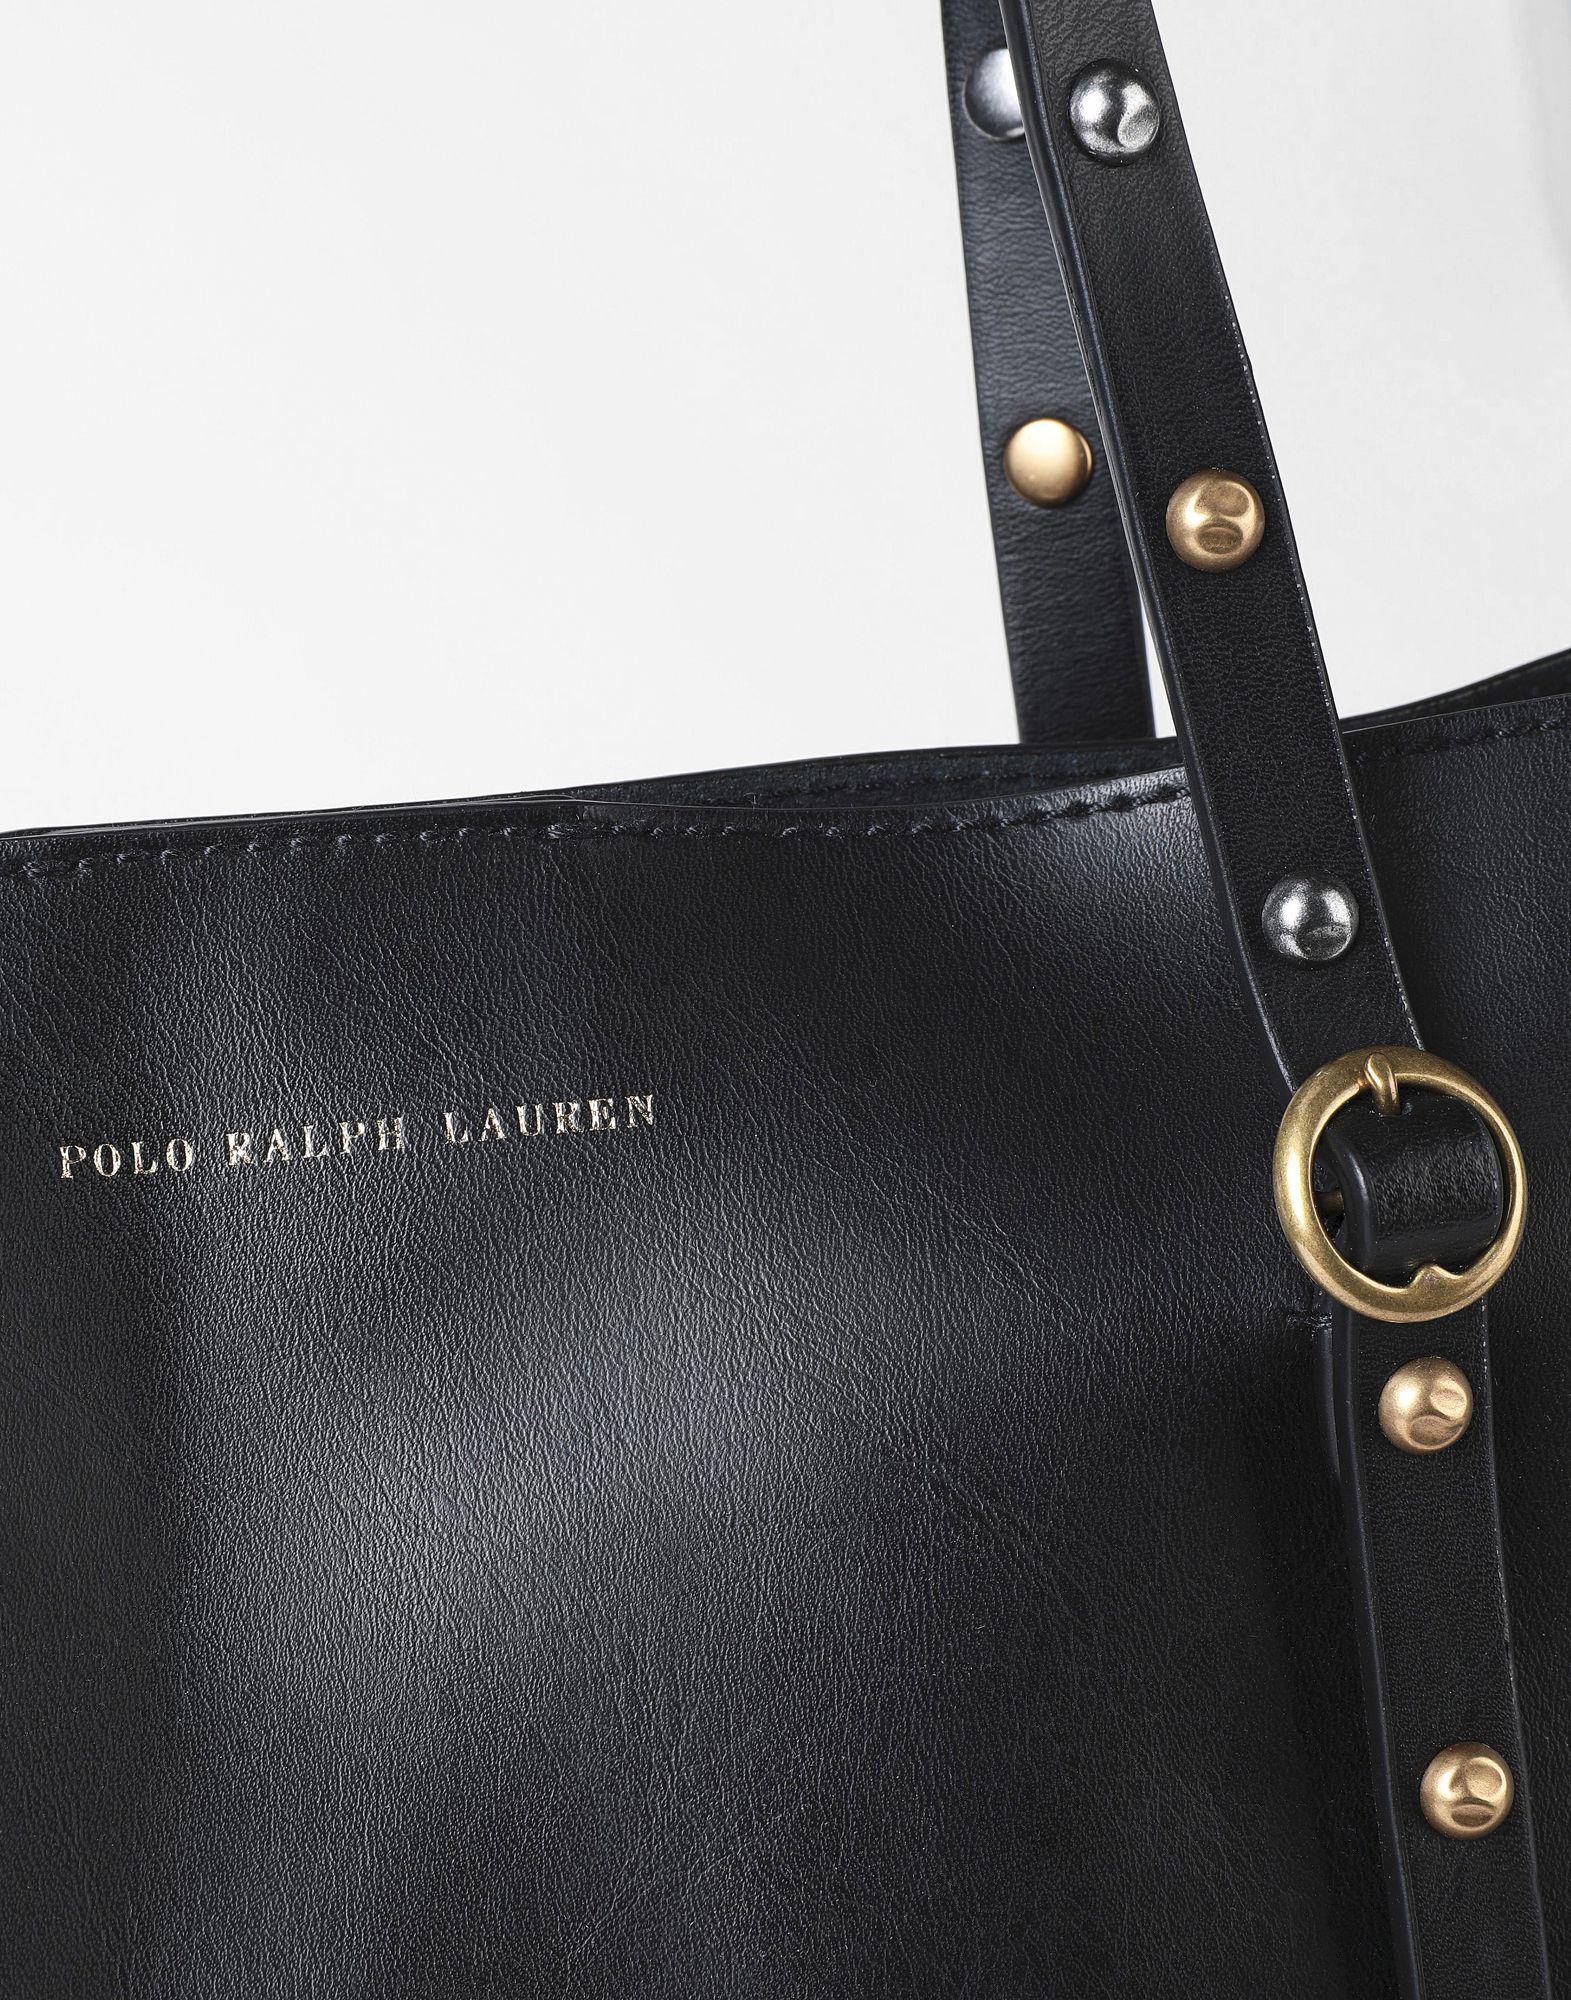 Polo Ralph Lauren Handbag in Black - Lyst f800fc5acb470